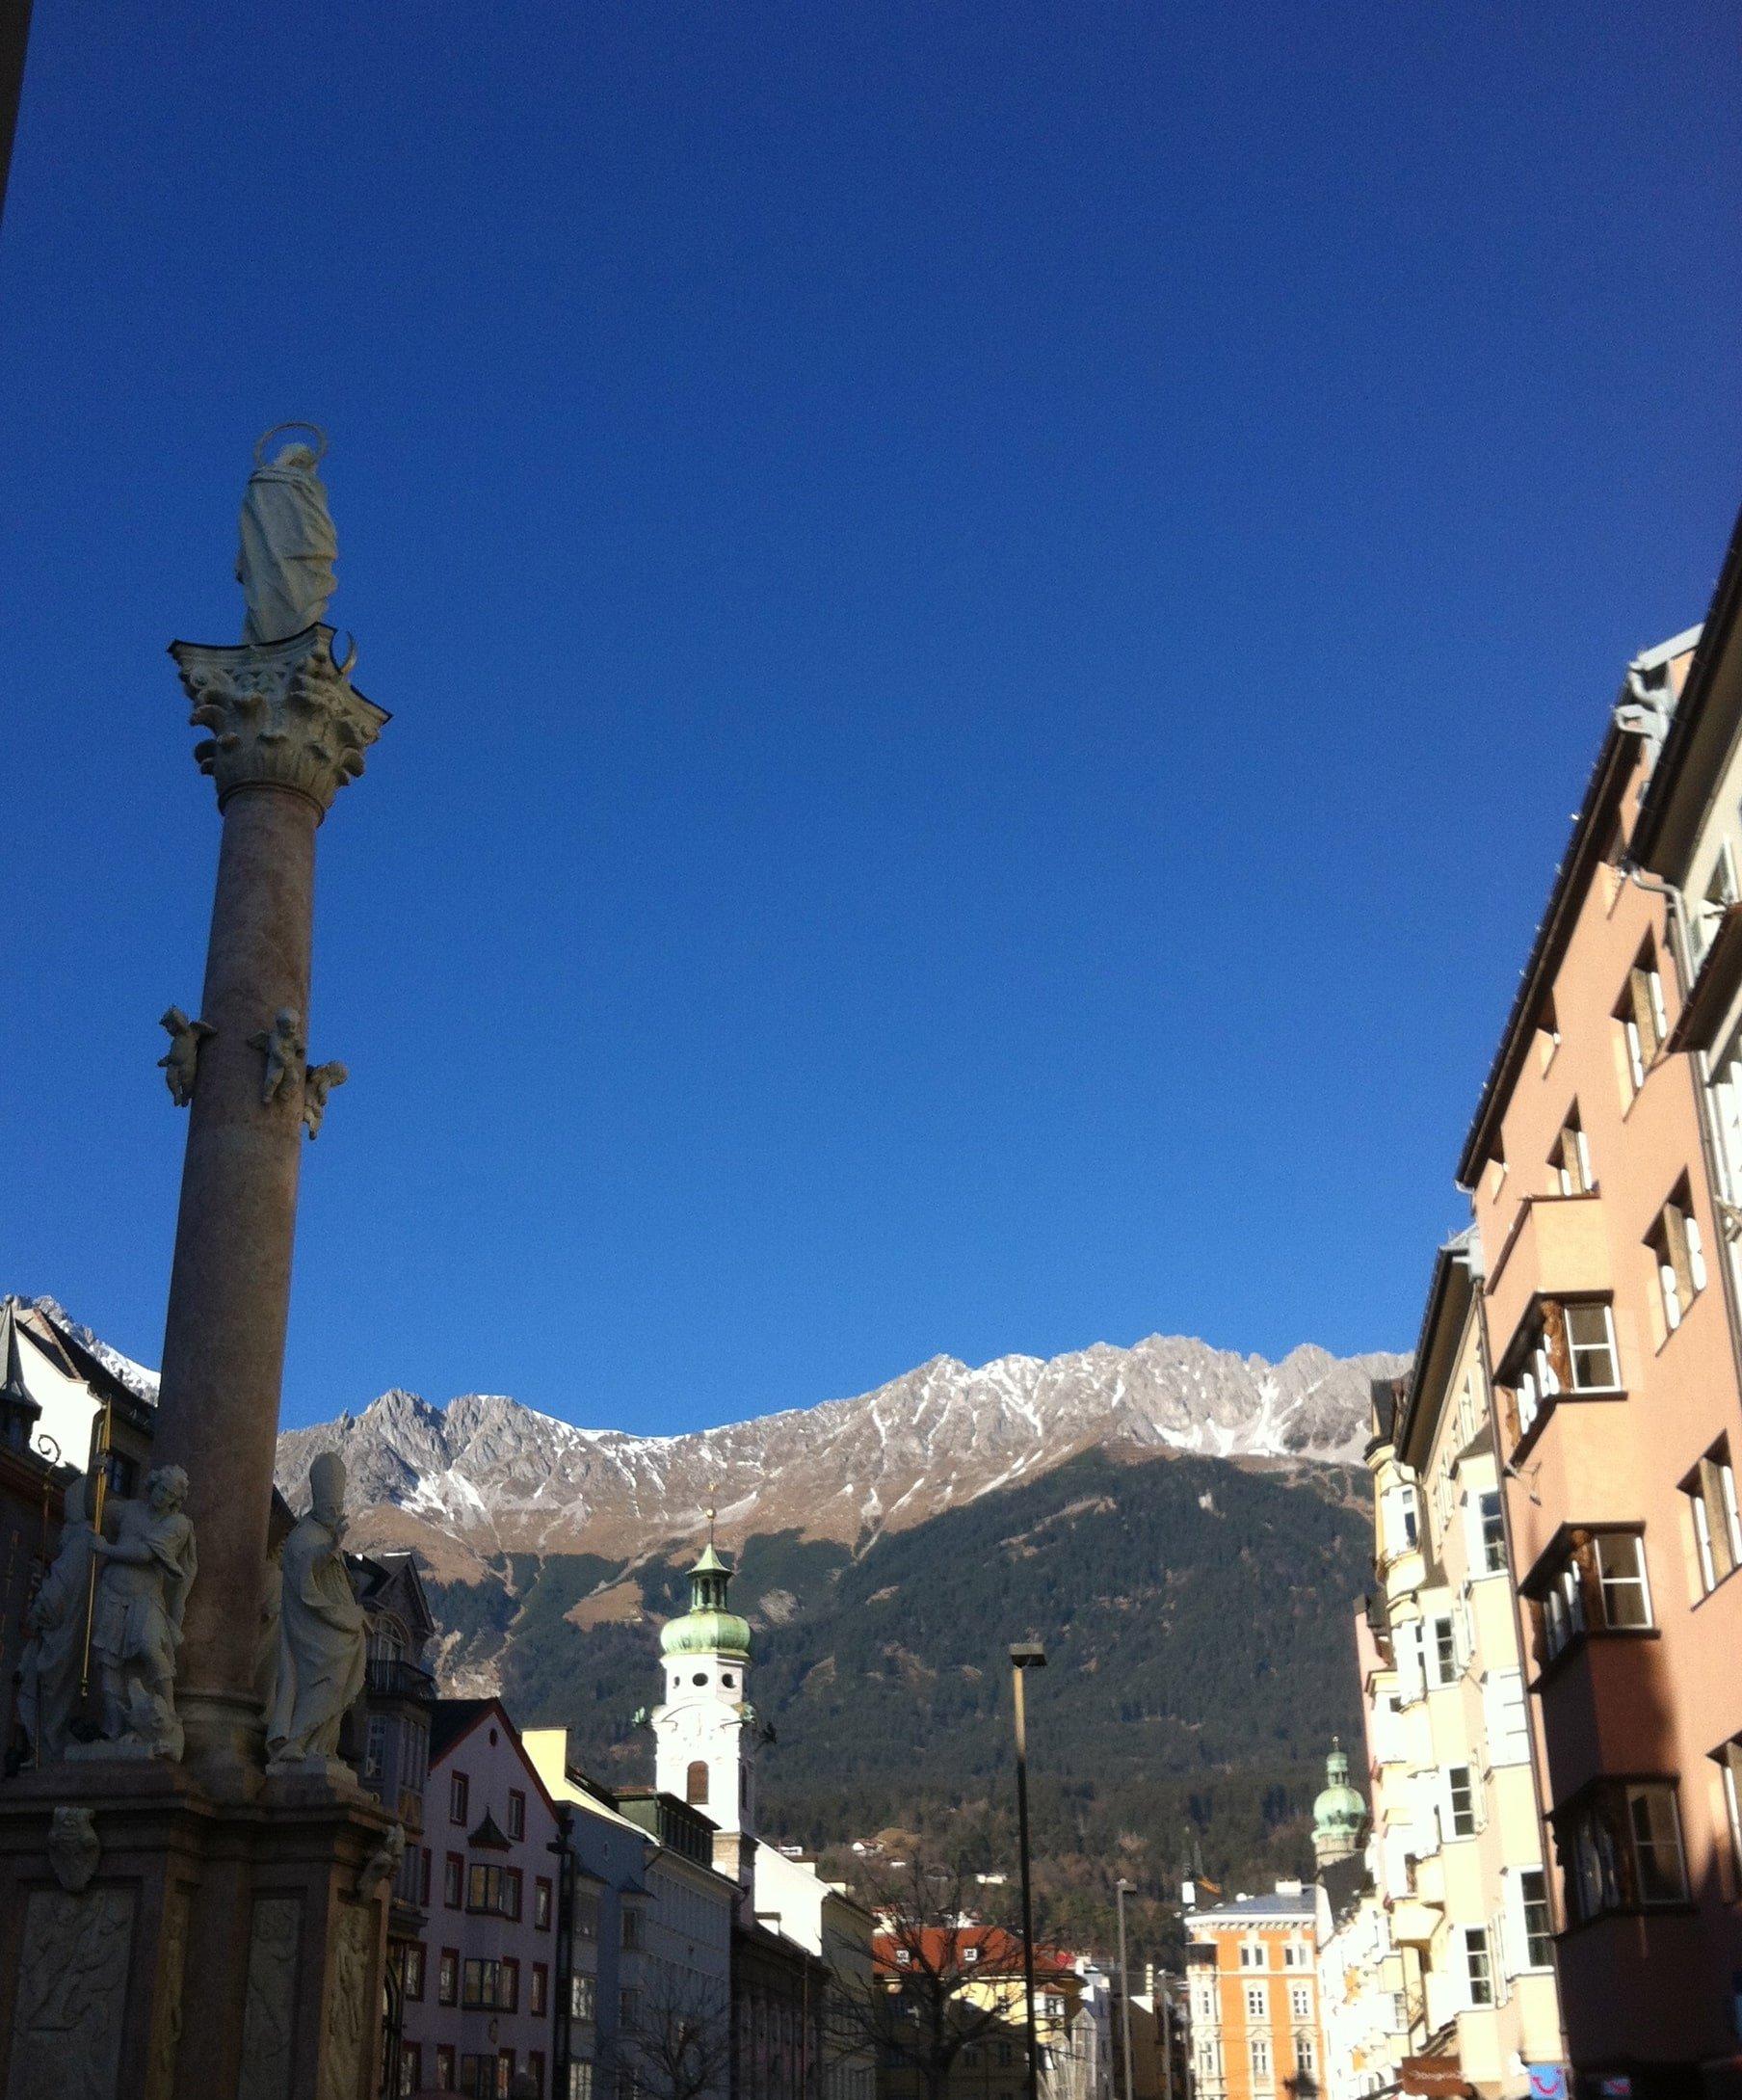 Calle peatonal de Innsbruck